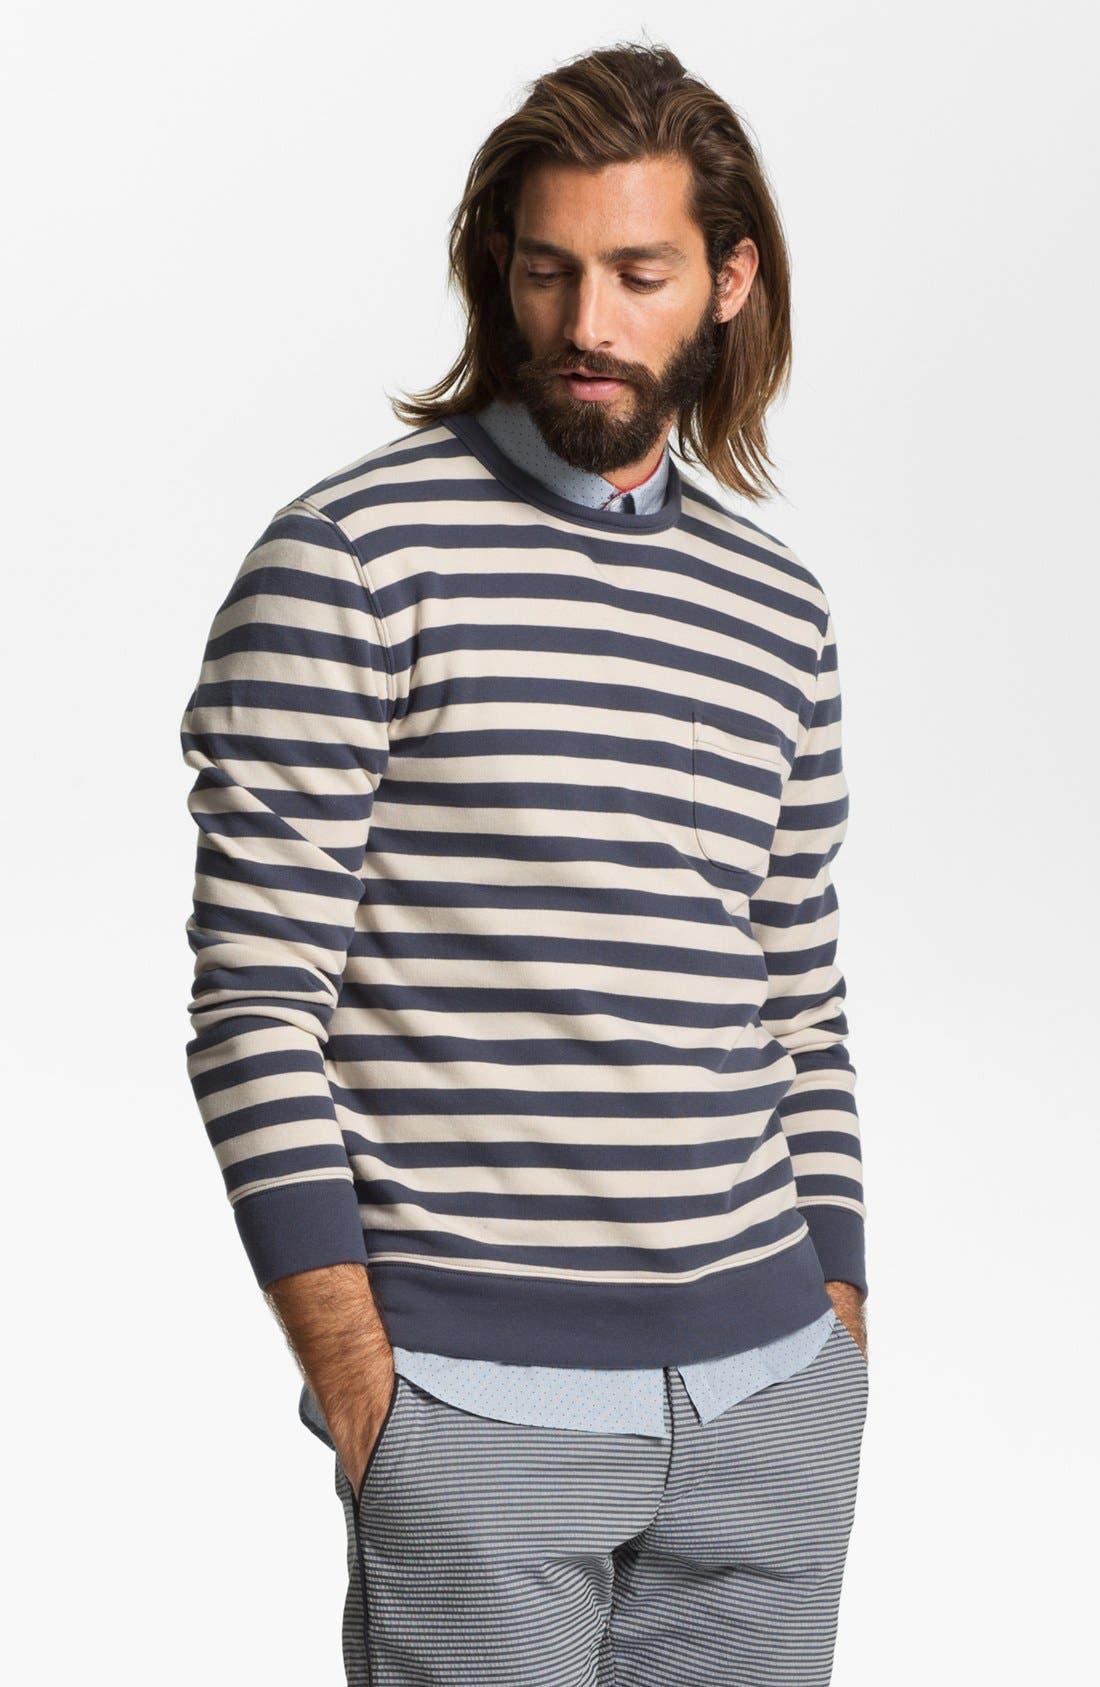 Alternate Image 1 Selected - Obey 'Dano' Stripe Crewneck Sweatshirt